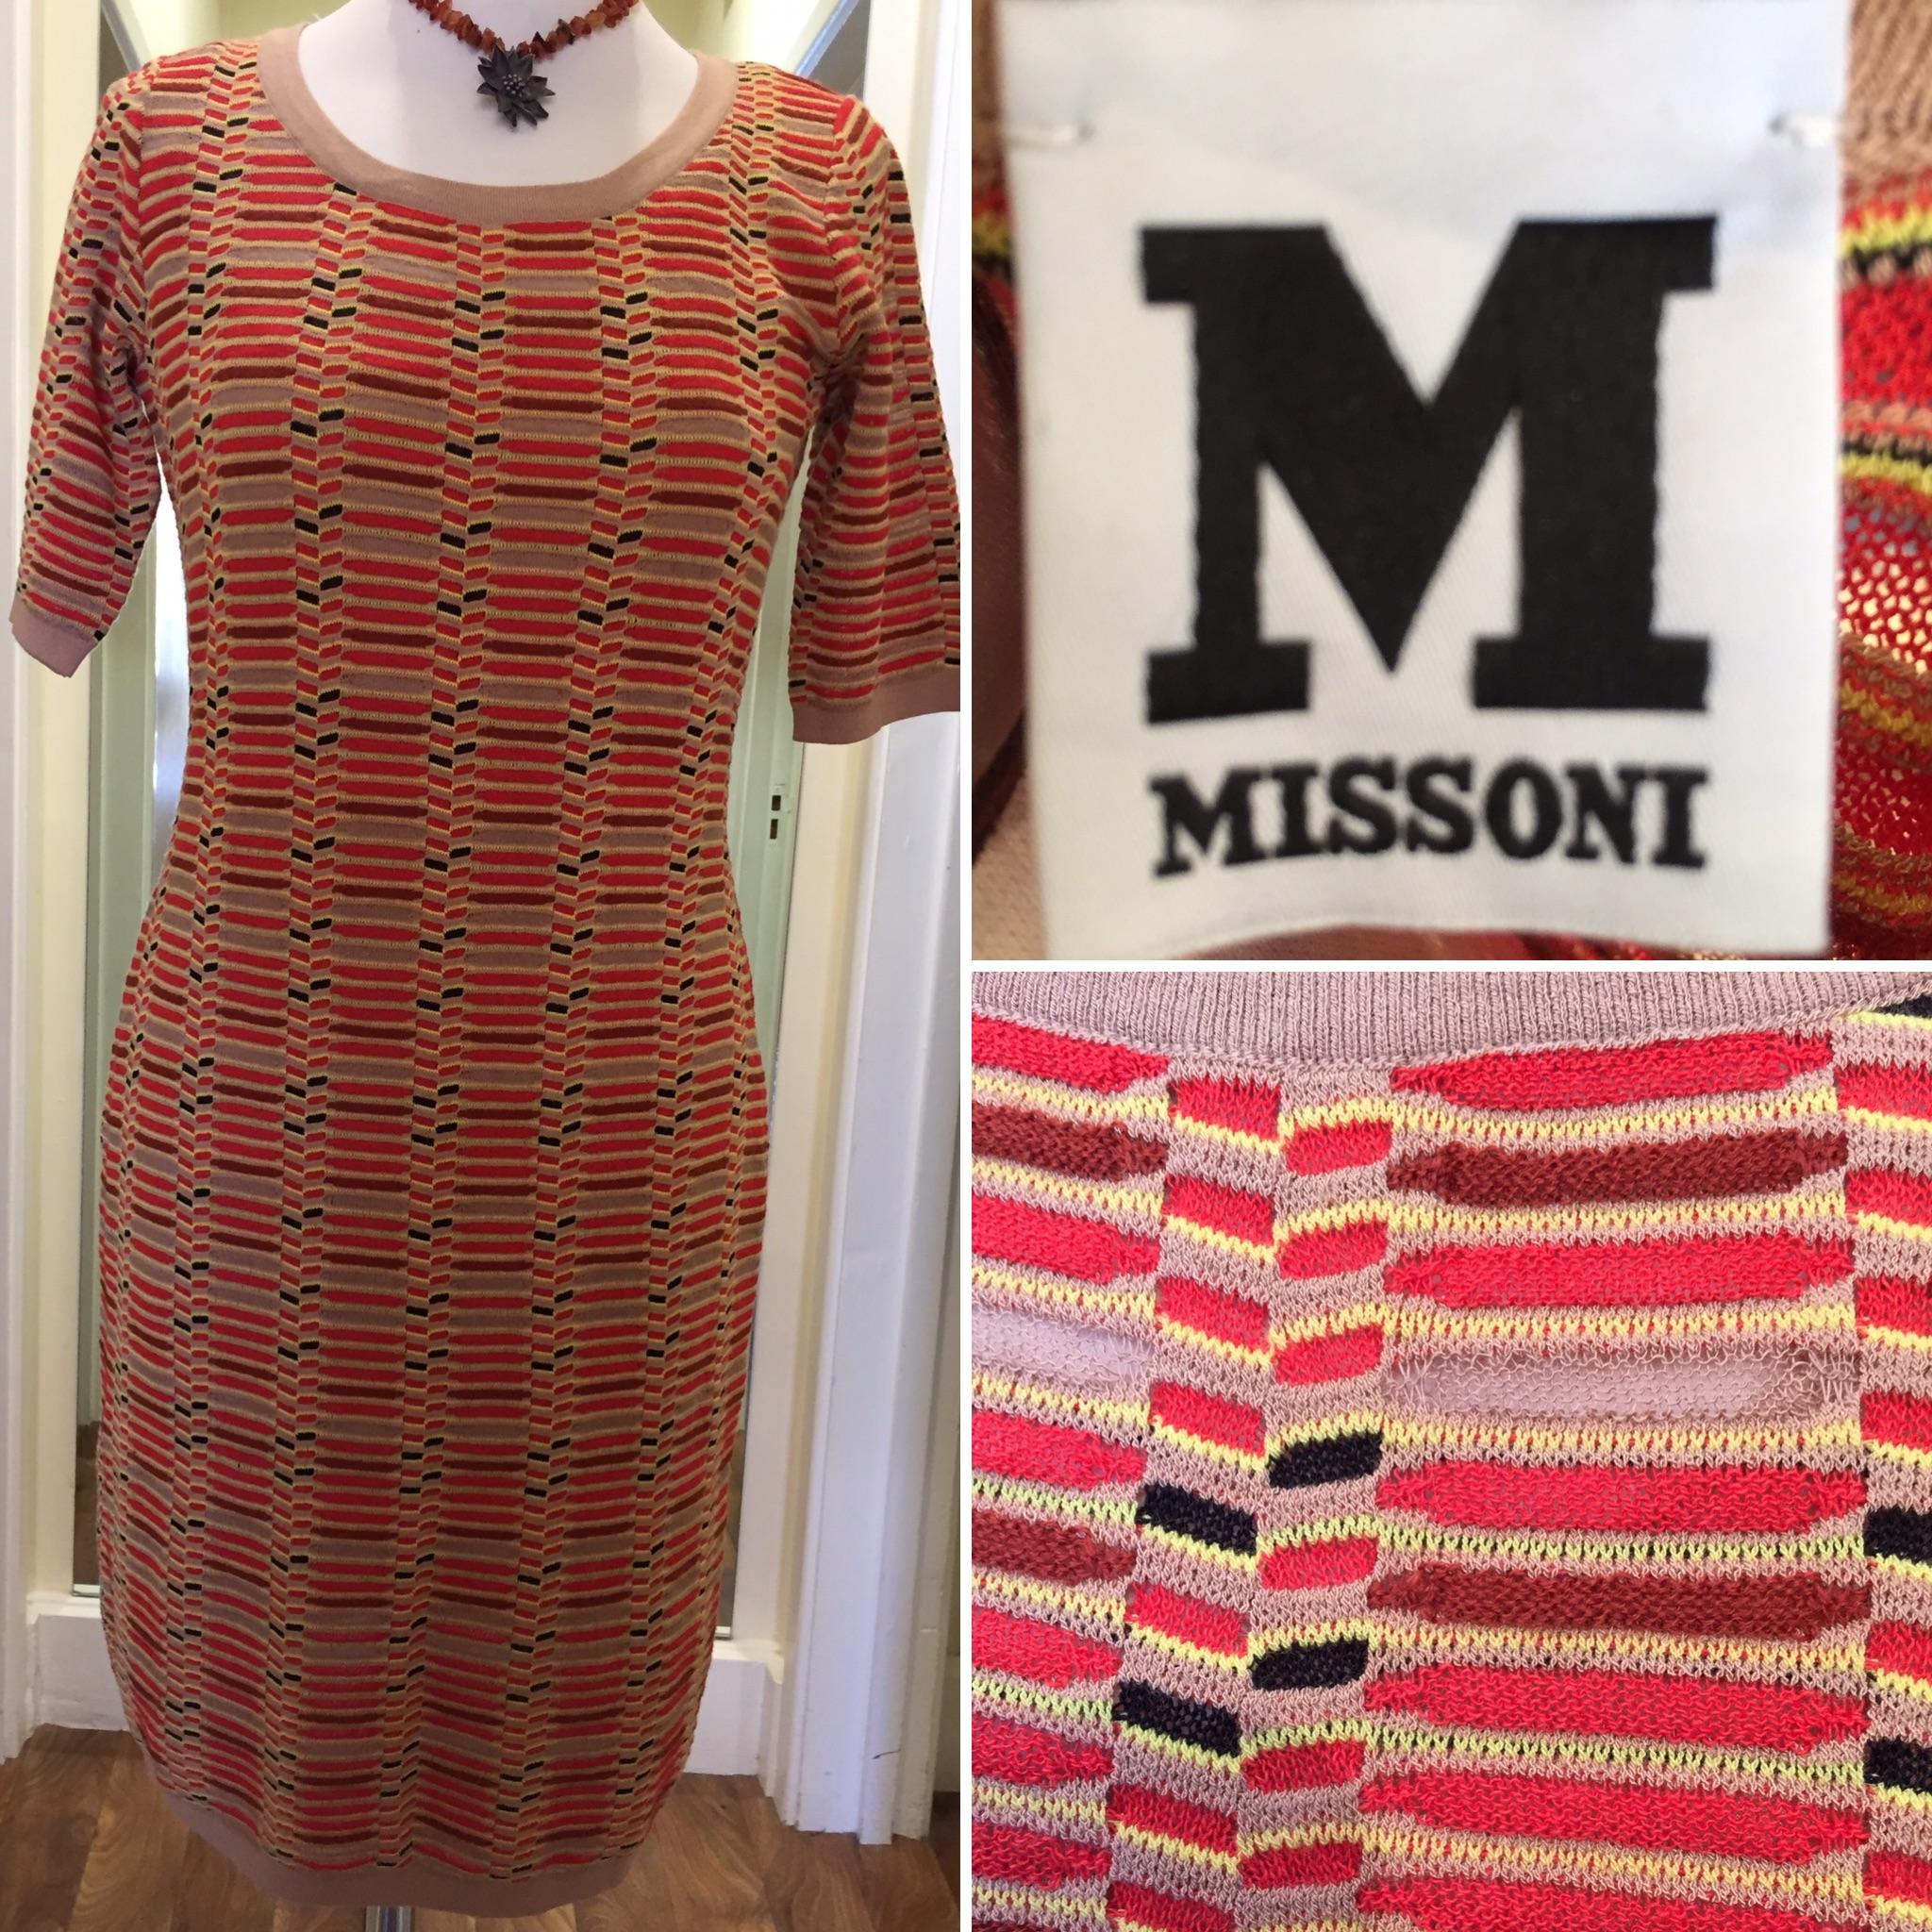 Missoni dress £99 size 12 vgc.jpg